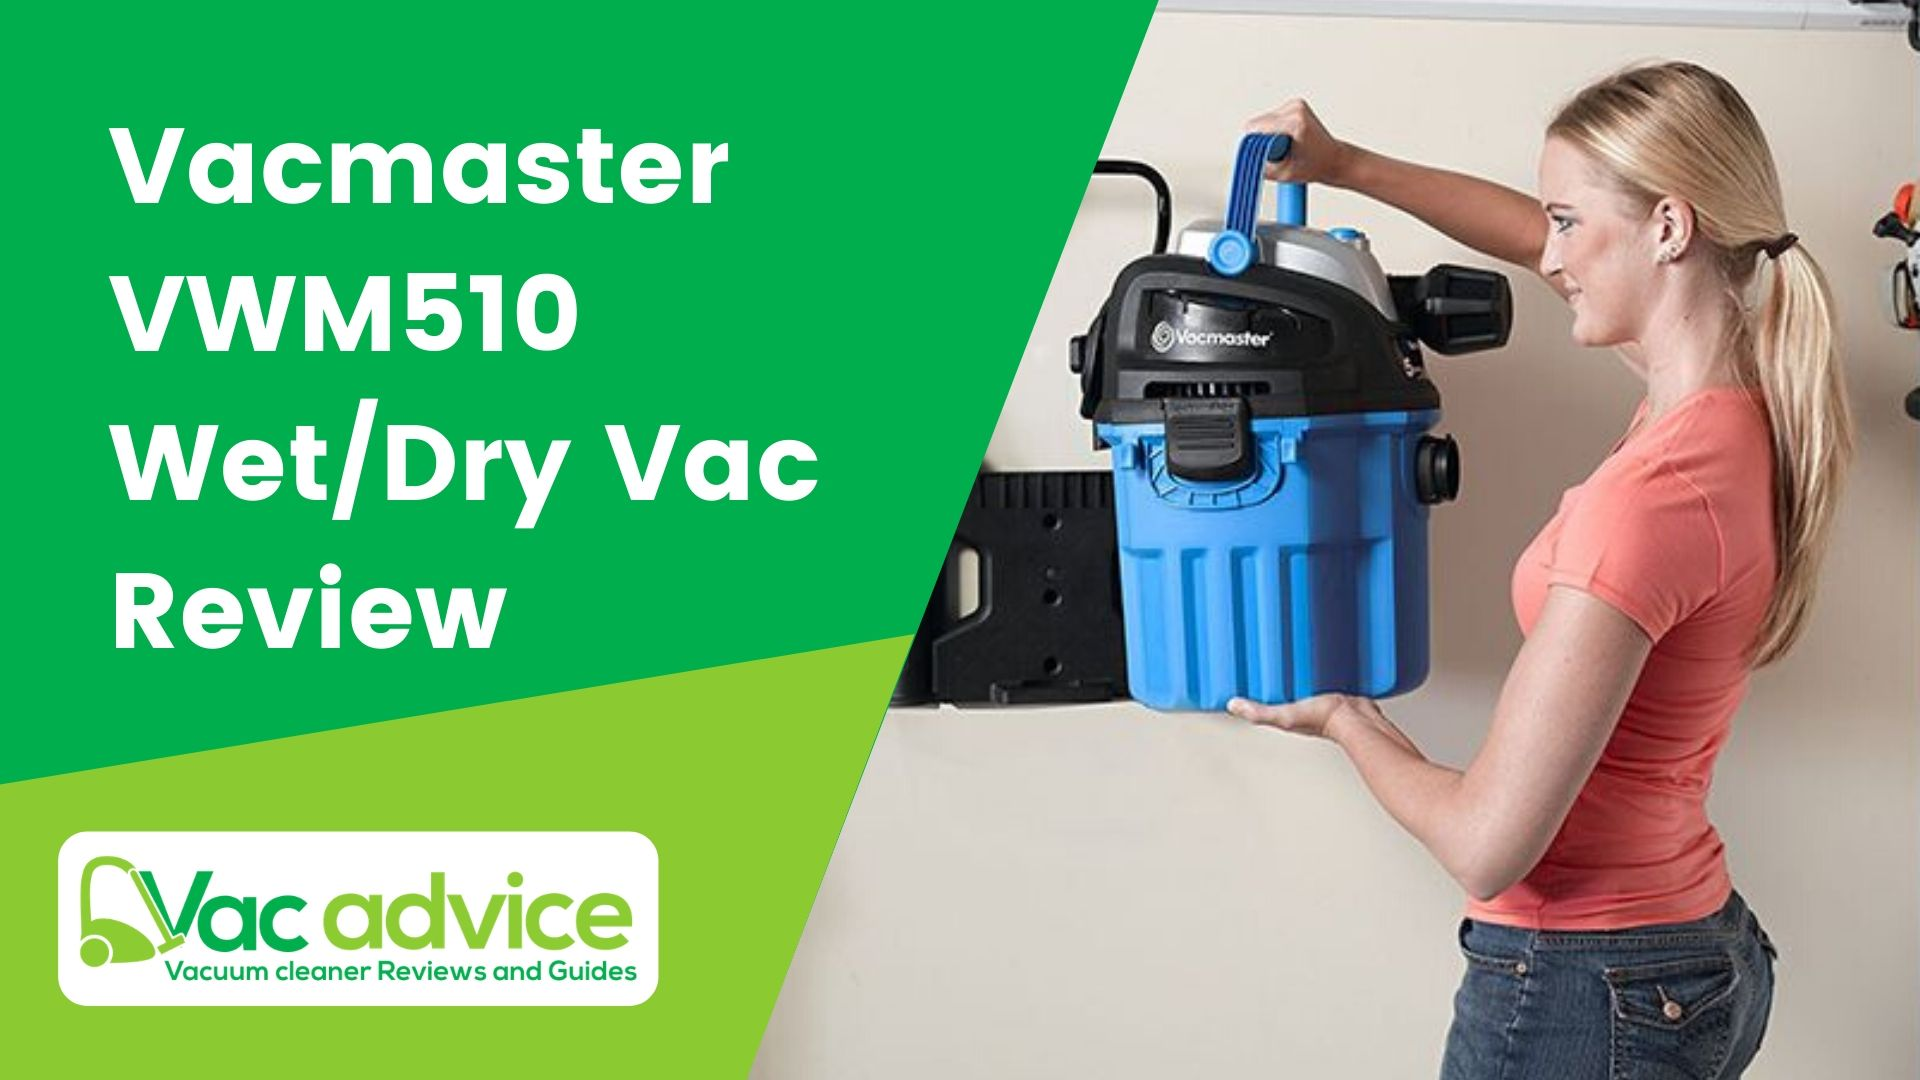 Vacmaster VWM510 Review